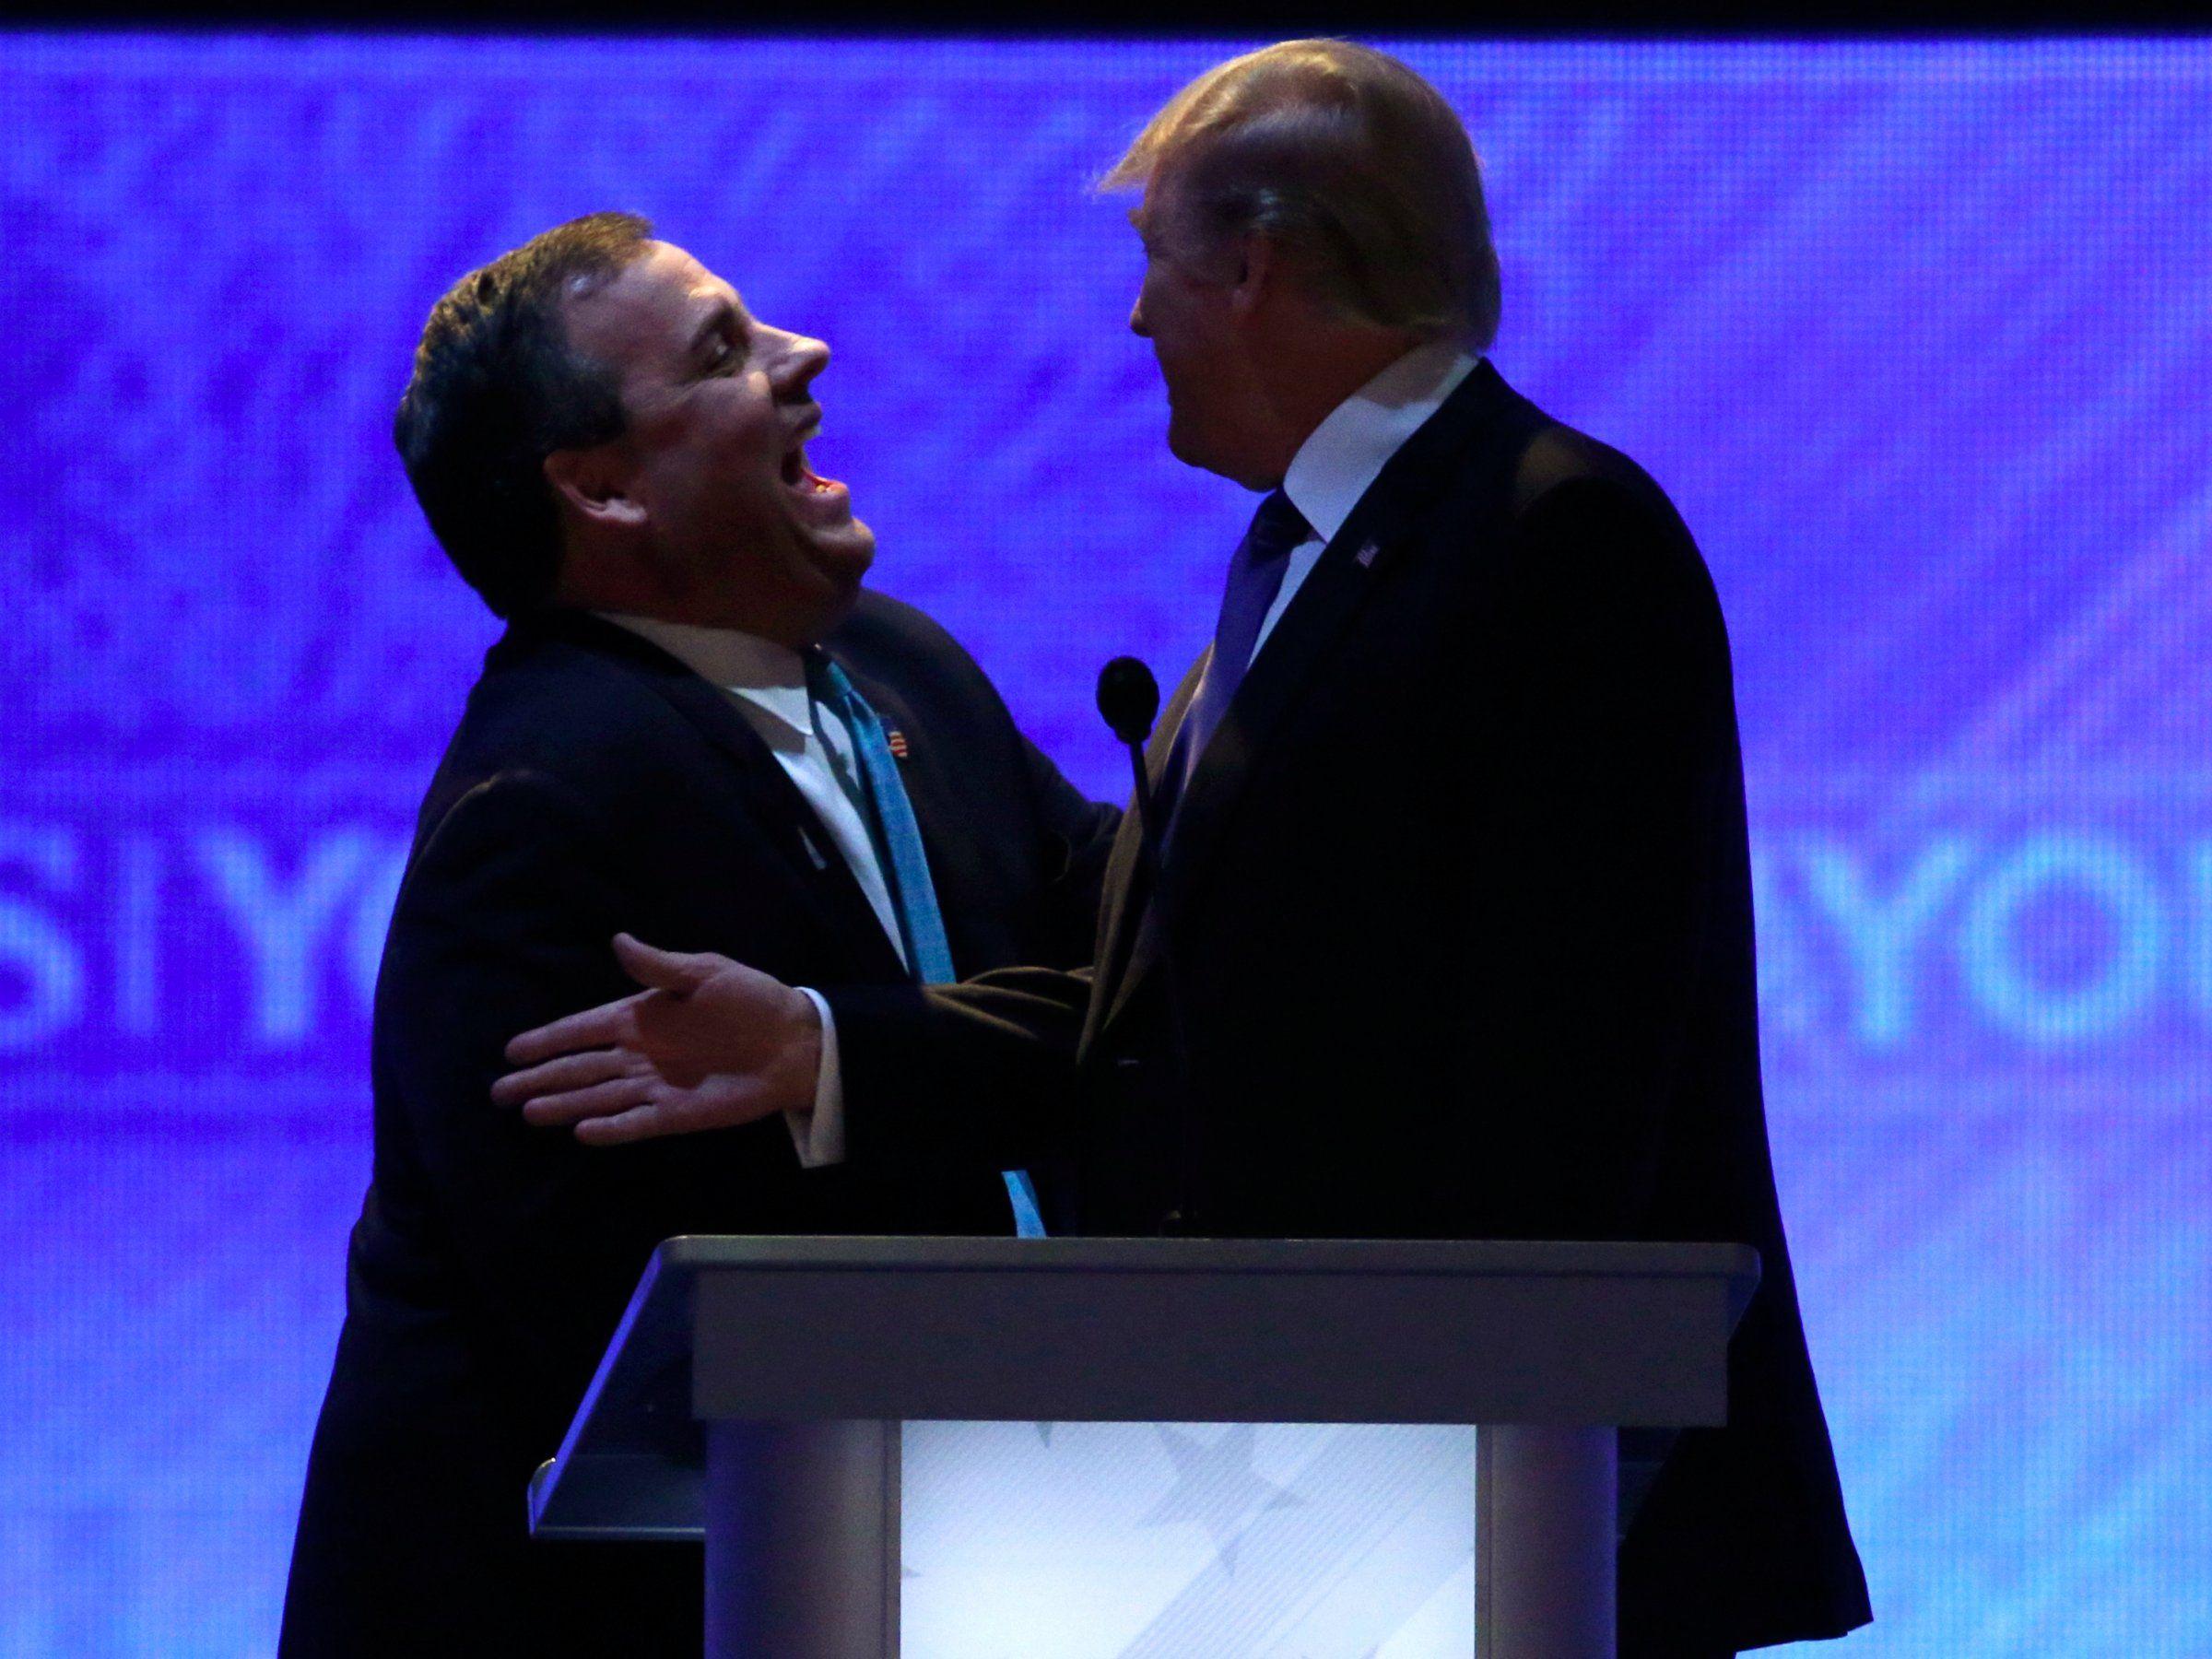 Trump will pick Chris Christie as his vicepresidental